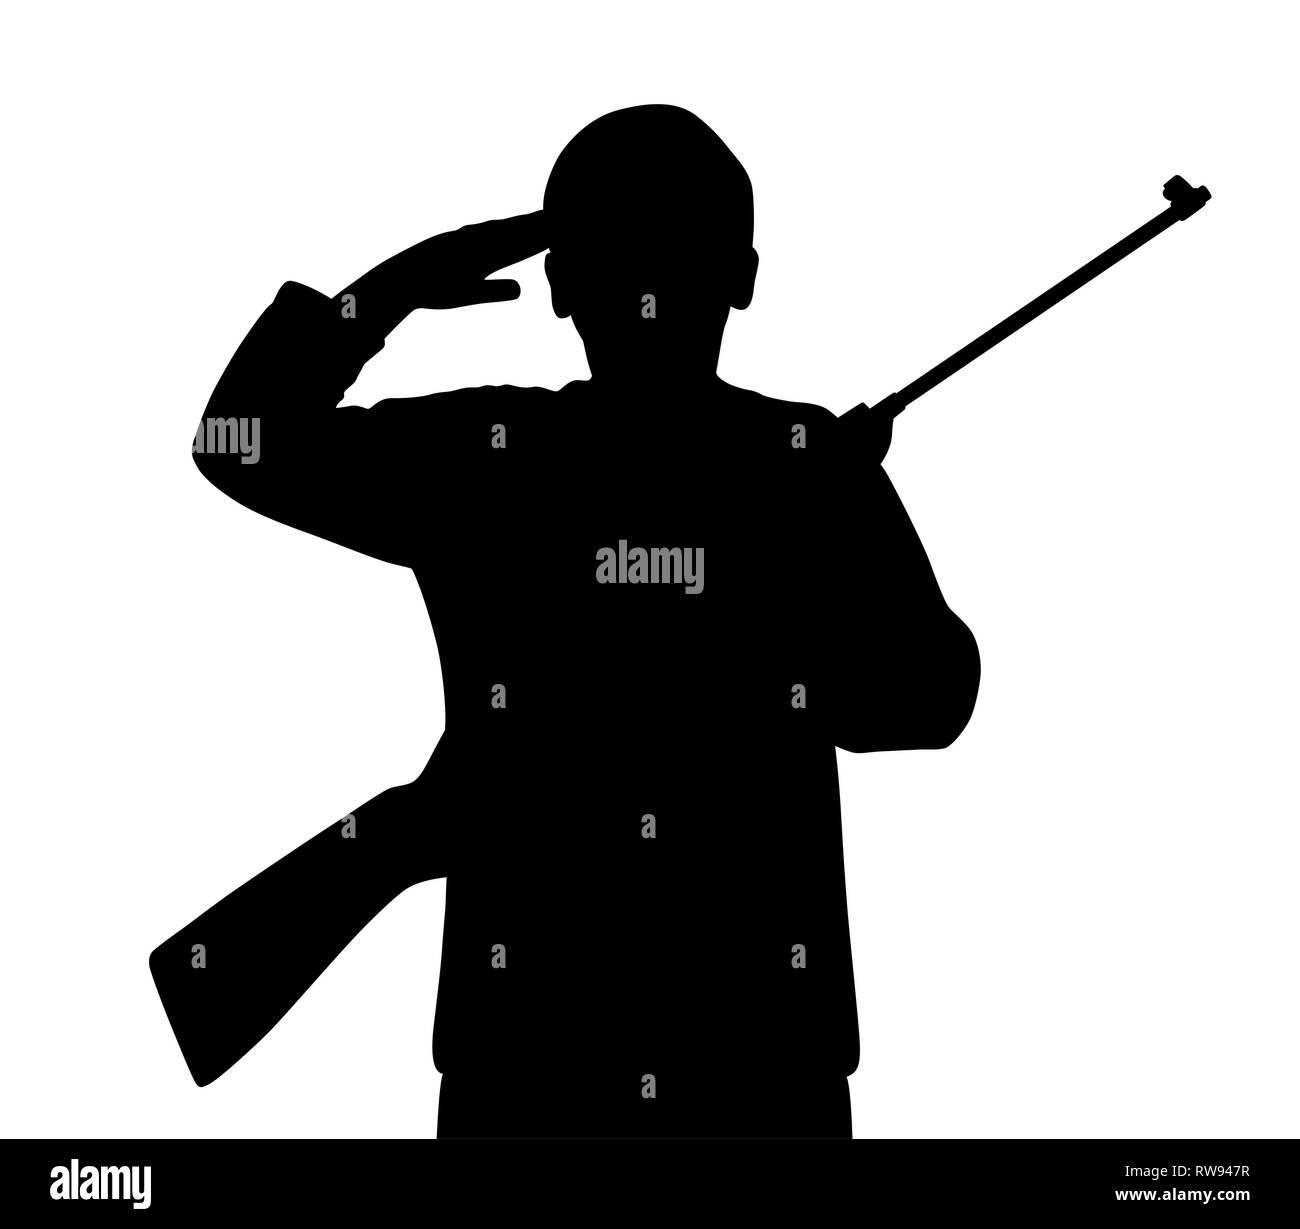 Young man saluting with gun - Stock Image